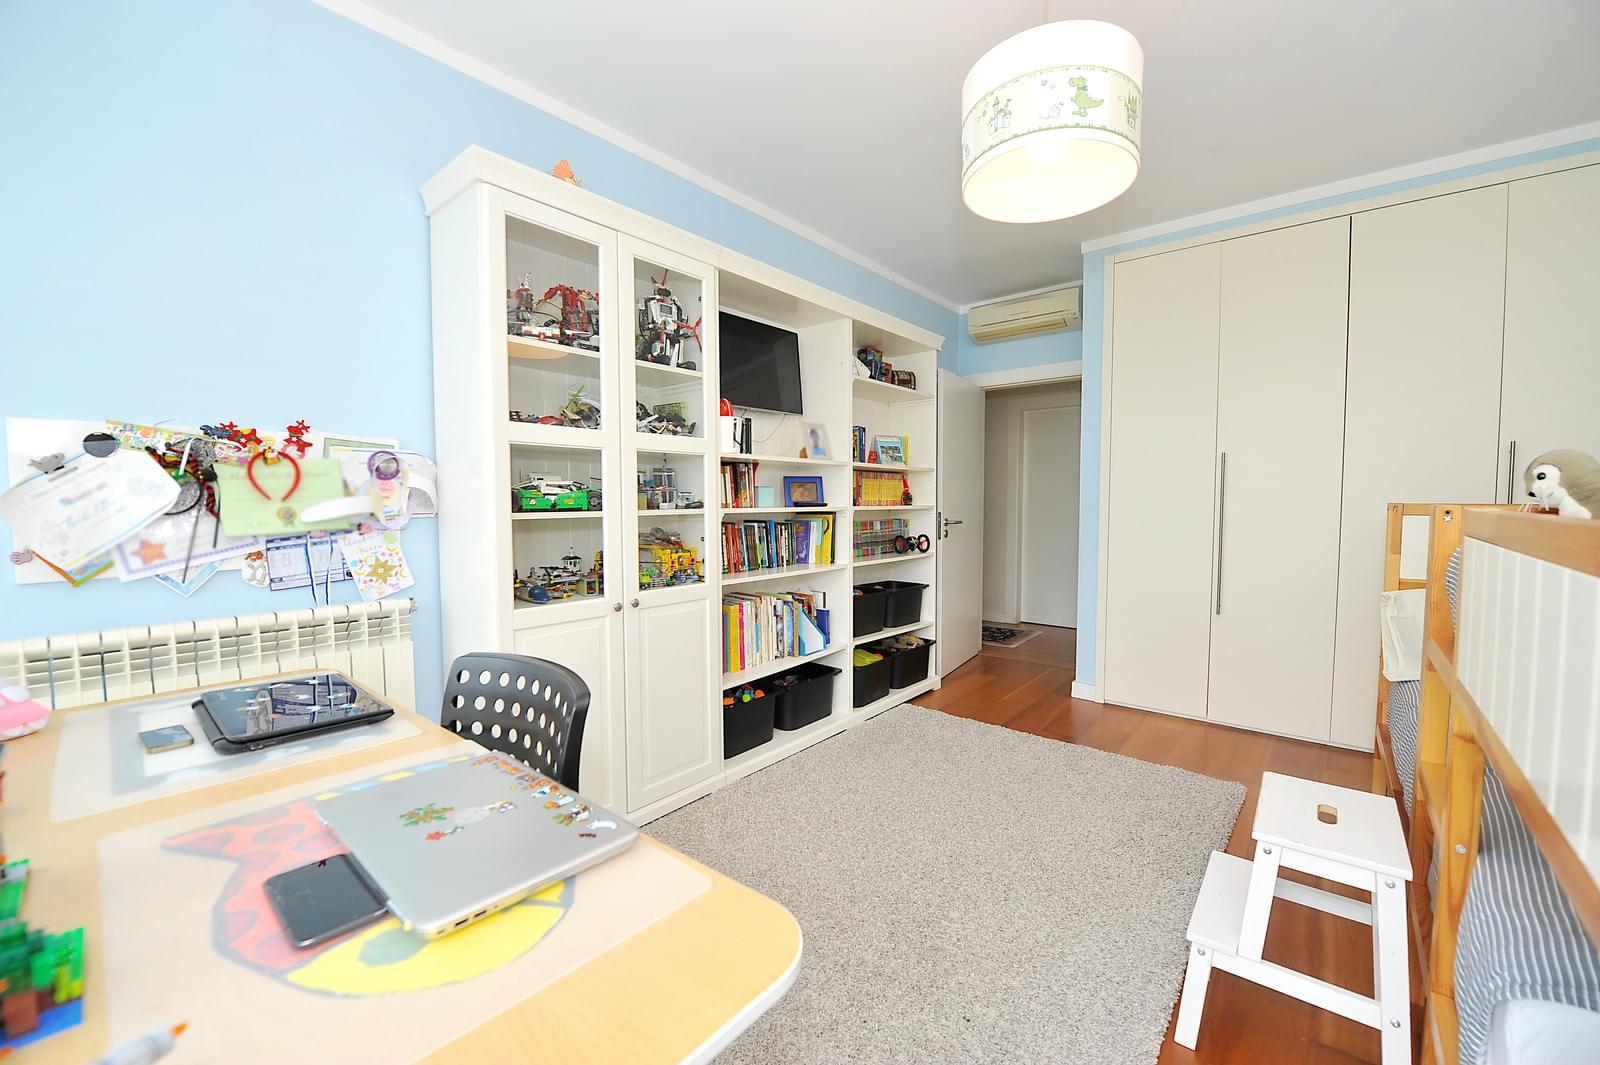 pf16896-apartamento-t4-2-oeiras-af9bd717-7087-4119-b071-d9fedf0d7d2e